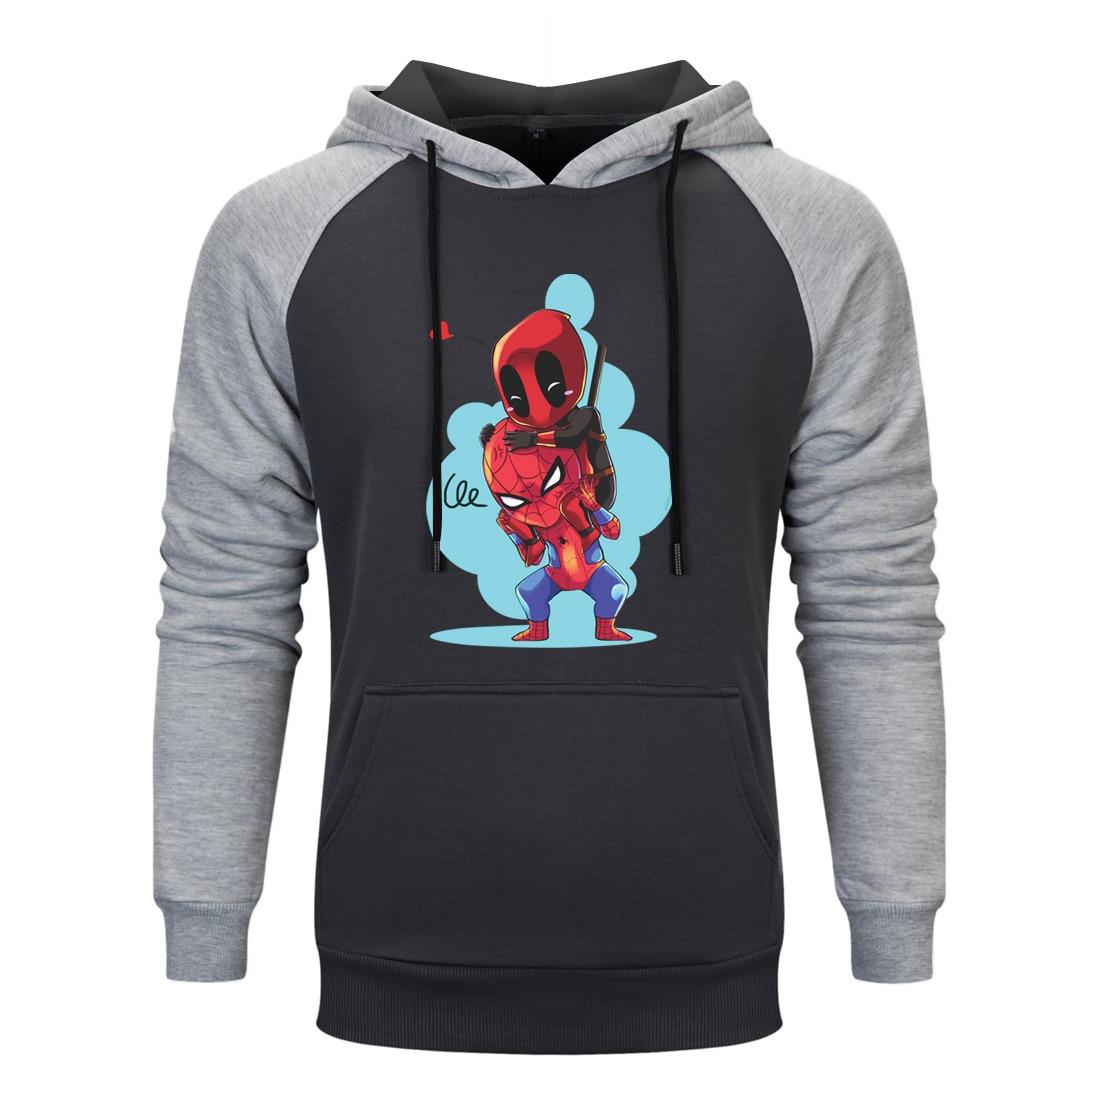 Spiderman Deadpool Cartoon Funny Hoodies Mens Casual Tracksuit Hooded Pullover 2020 Fashion High Quality Sportswear Raglan Hoody